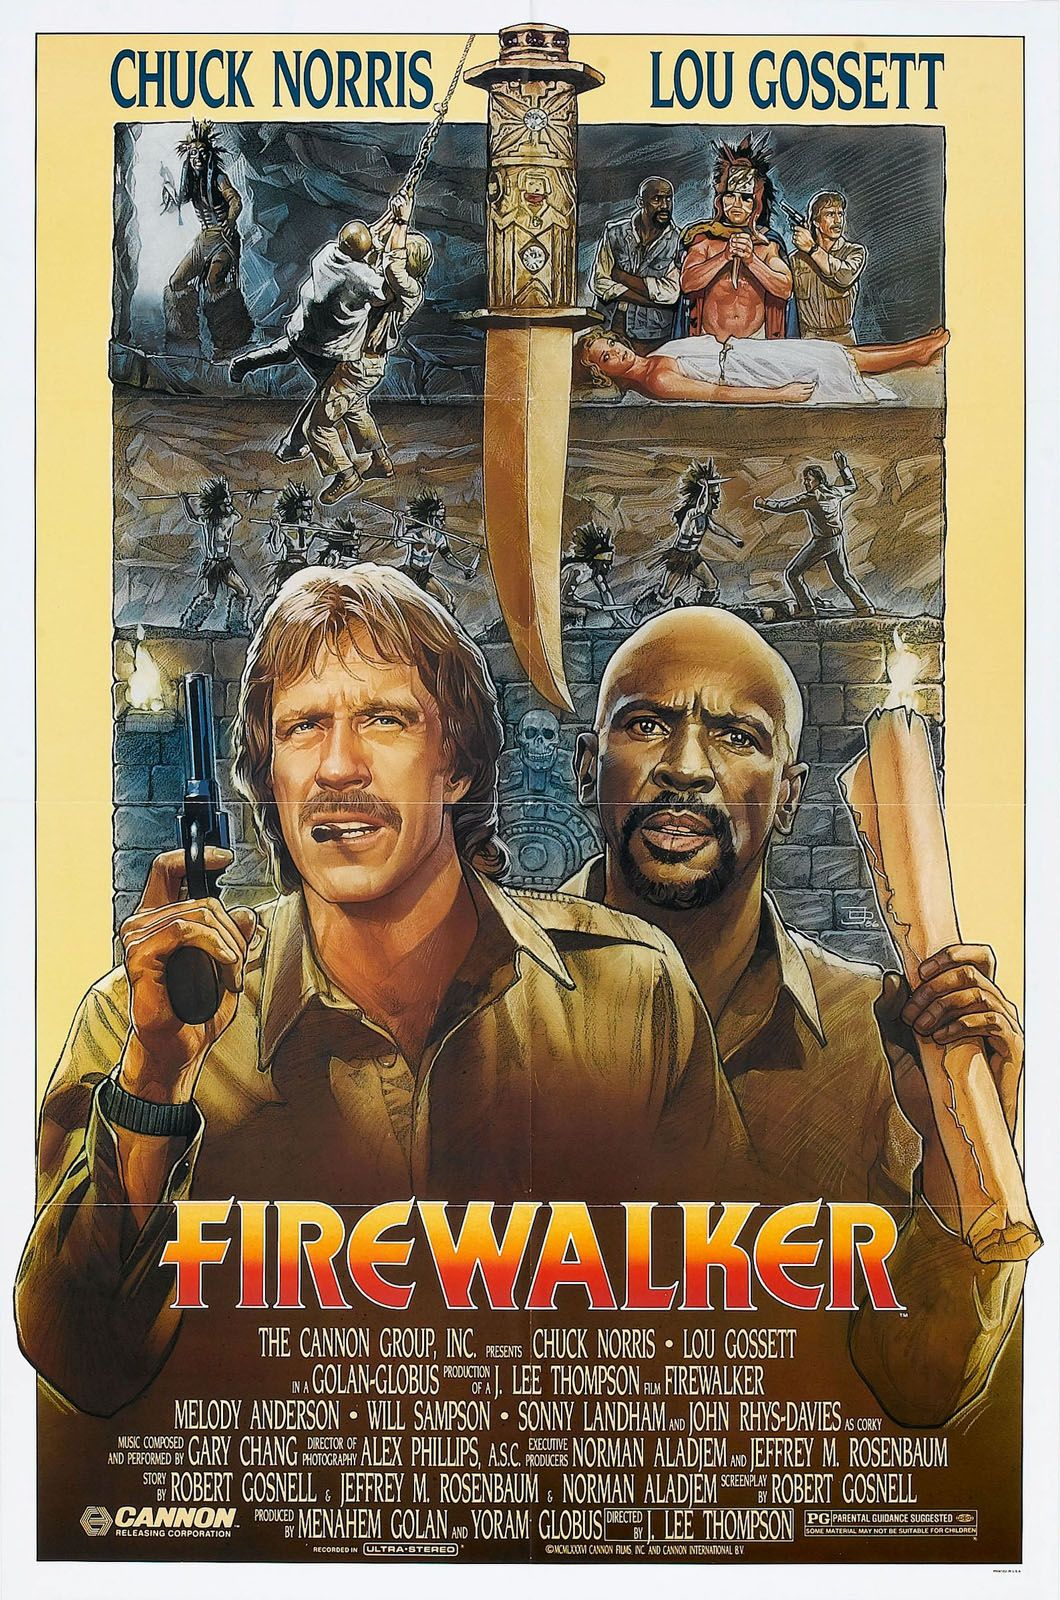 Firewalker 1986 Movies Ive Seen Pinterest Film Posters Short Circuit 27x40 Movie Poster